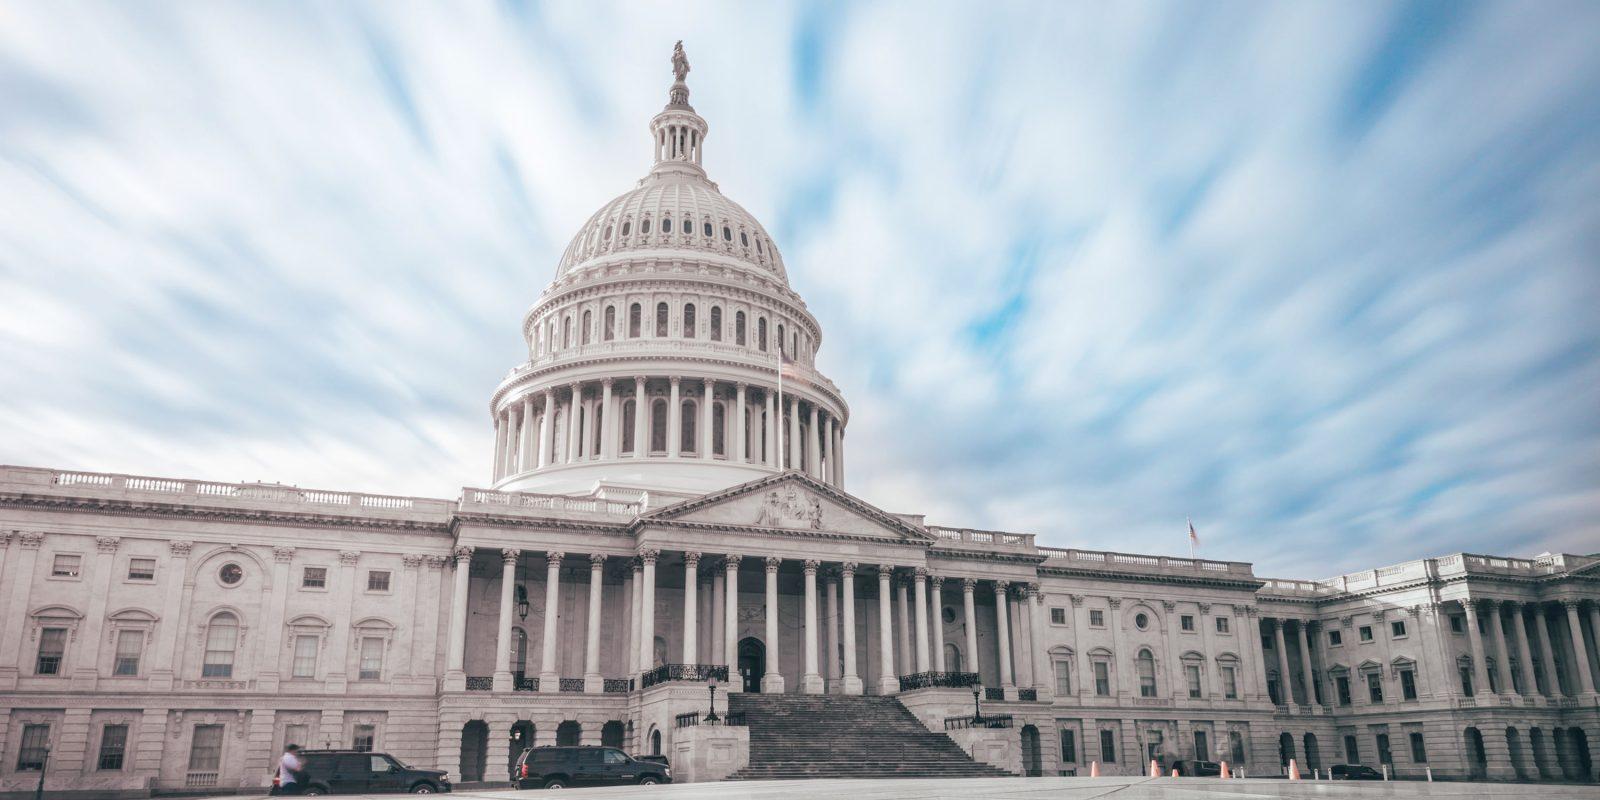 One of five planned US antitrust bills targets Apple's App Store